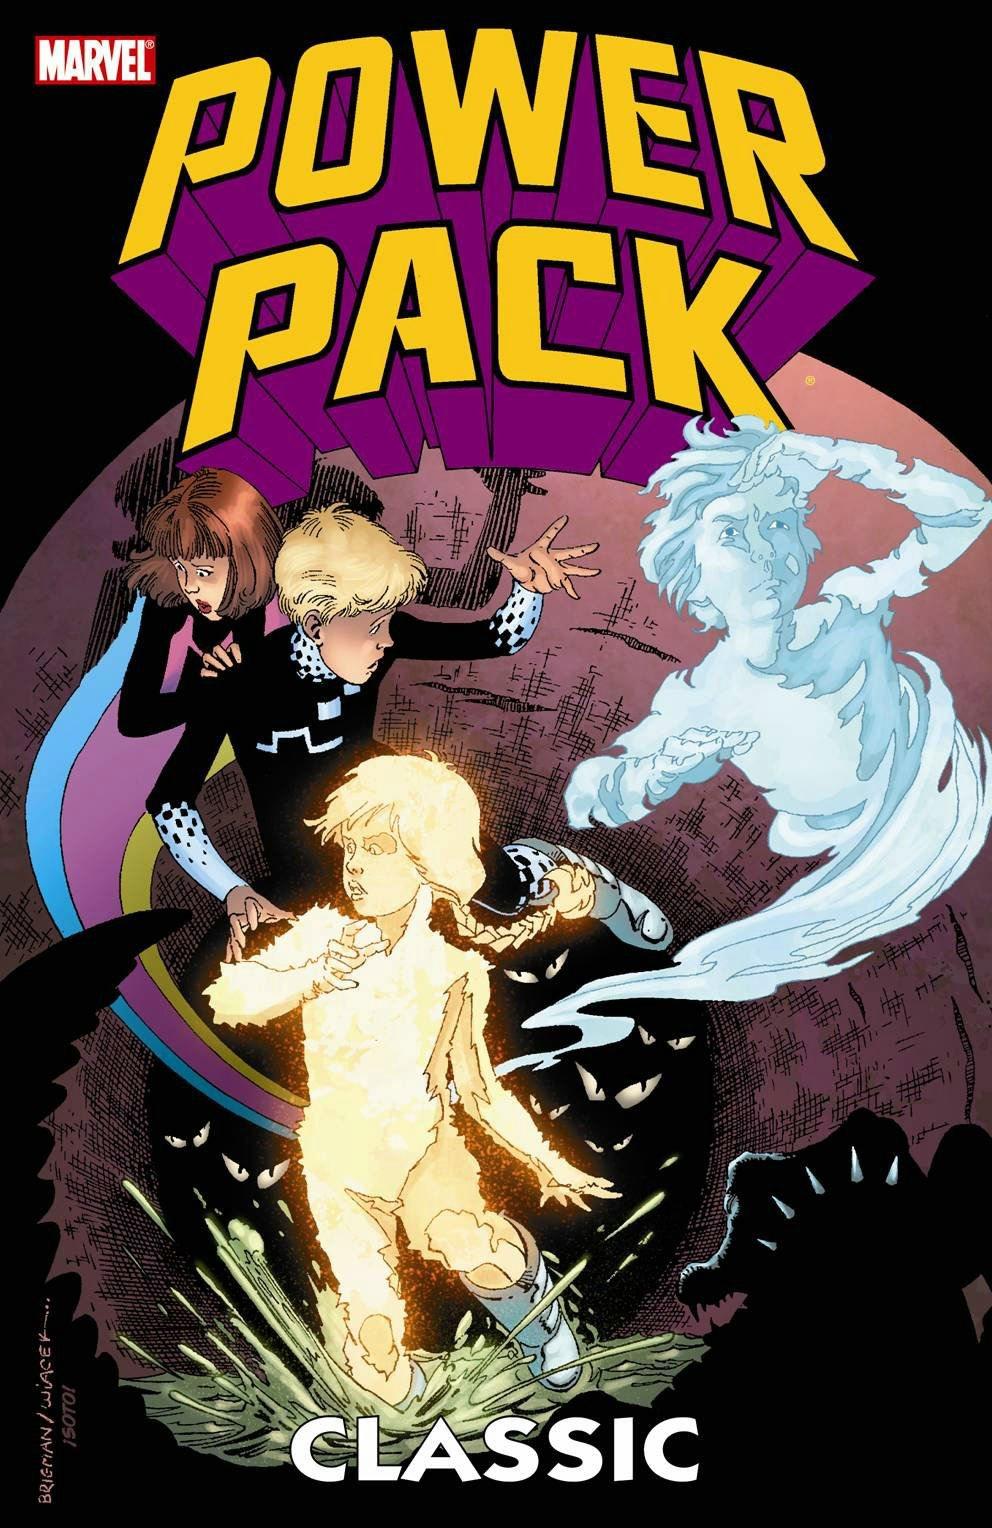 Power Pack Classic Volume 2 TPB: Amazon.es: Simonson, Louise ...